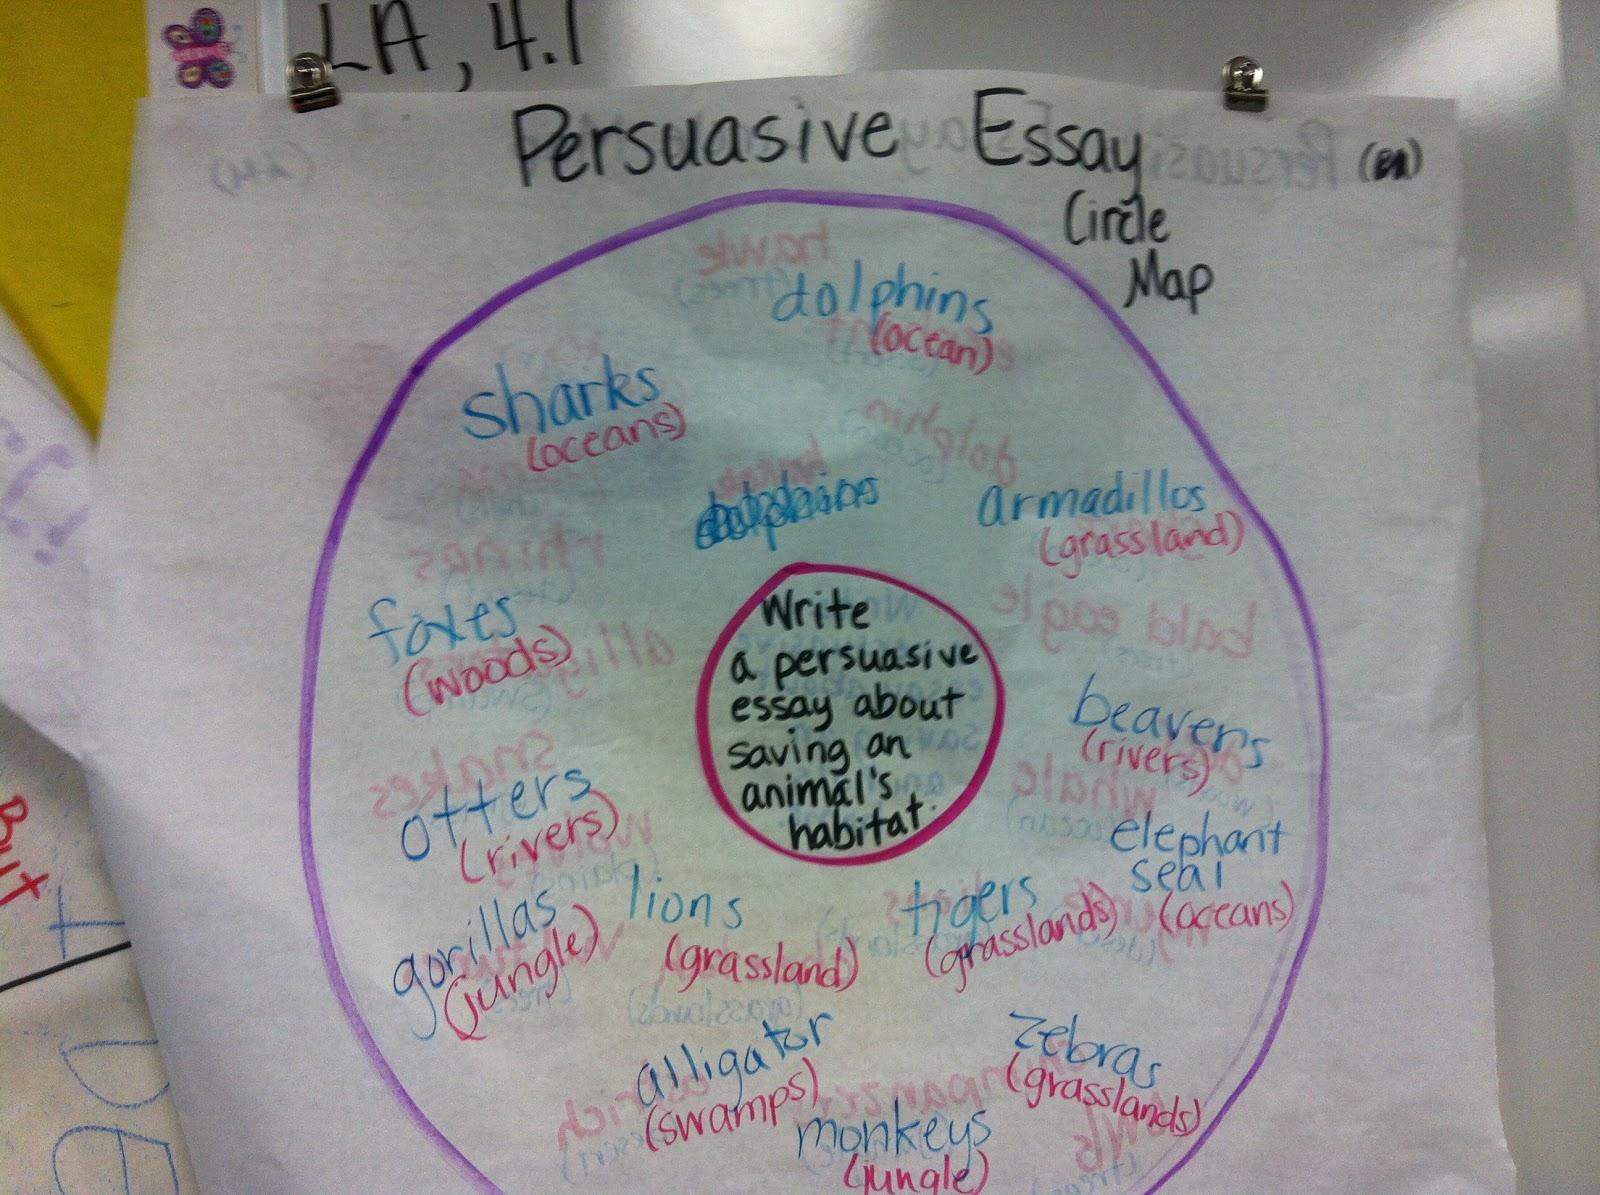 plastic surgery persuasive essay writersgroup968 web fc2 com plastic surgery persuasive essay